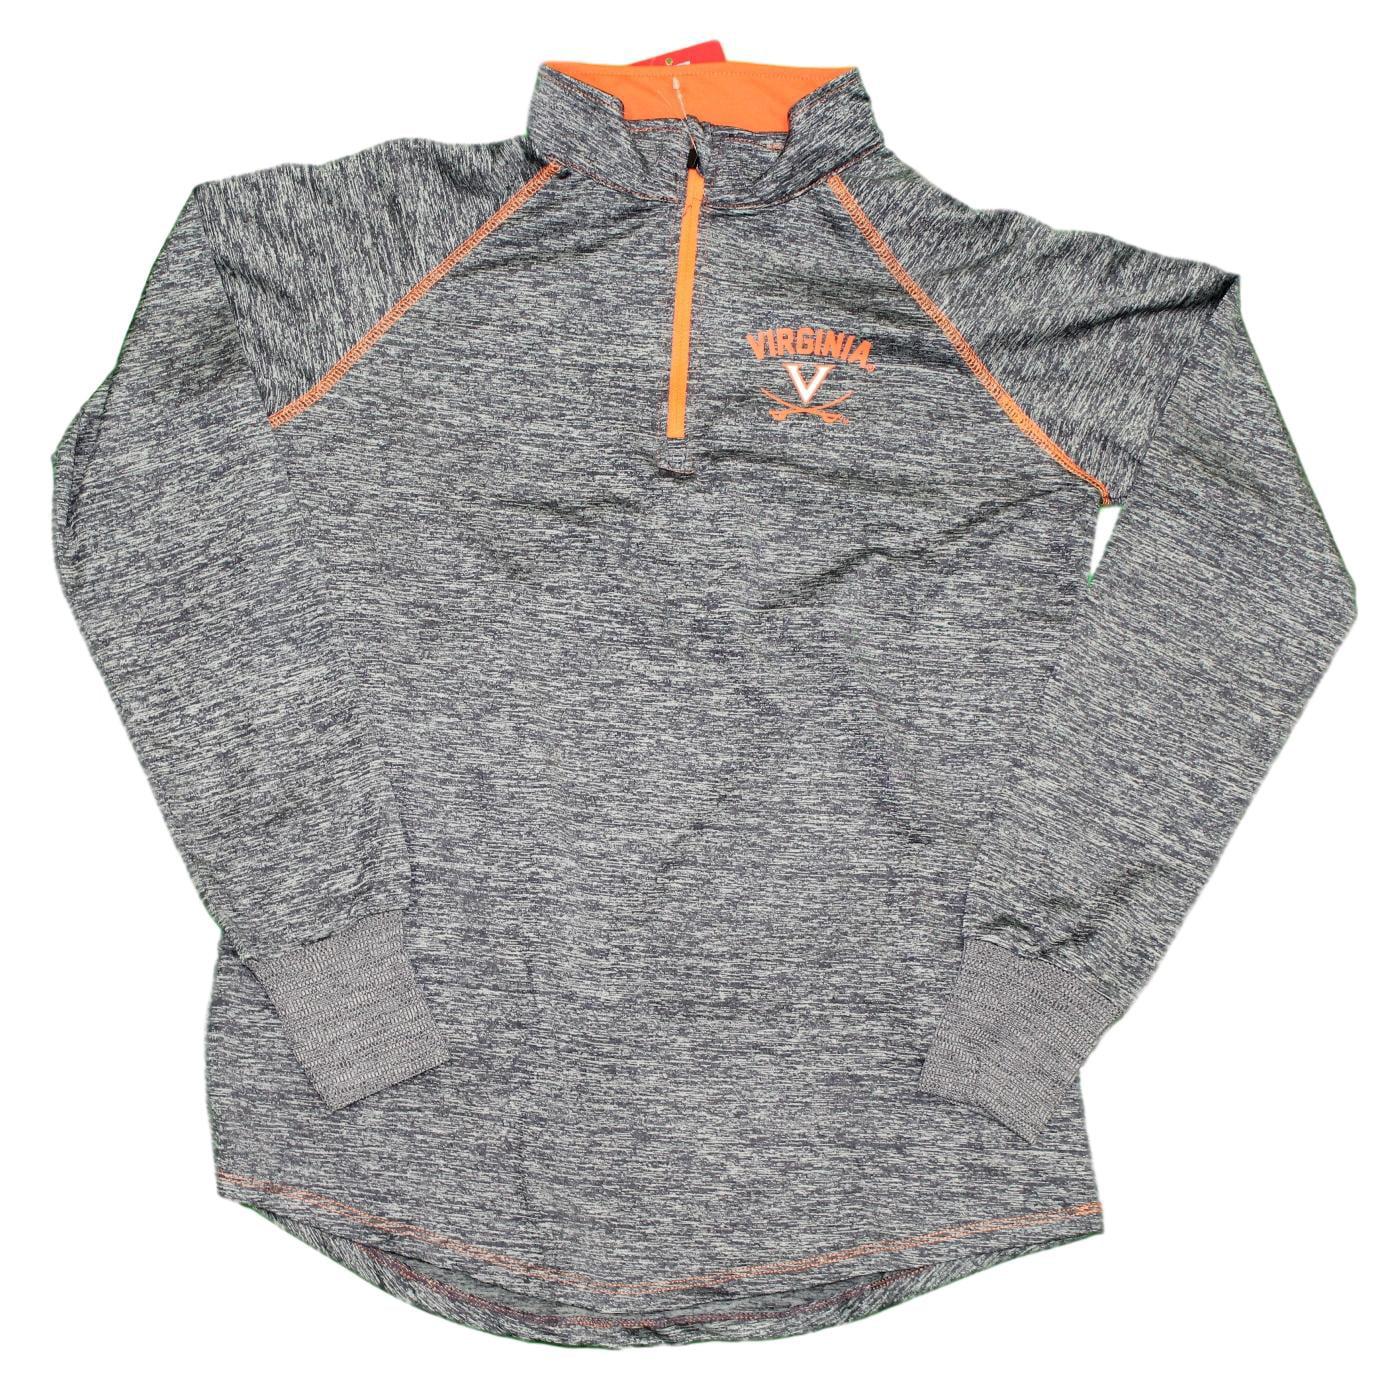 "Virginia Cavaliers Women's NCAA ""Bikram"" 1/4 Zip Long Sleeve Top Shirt"